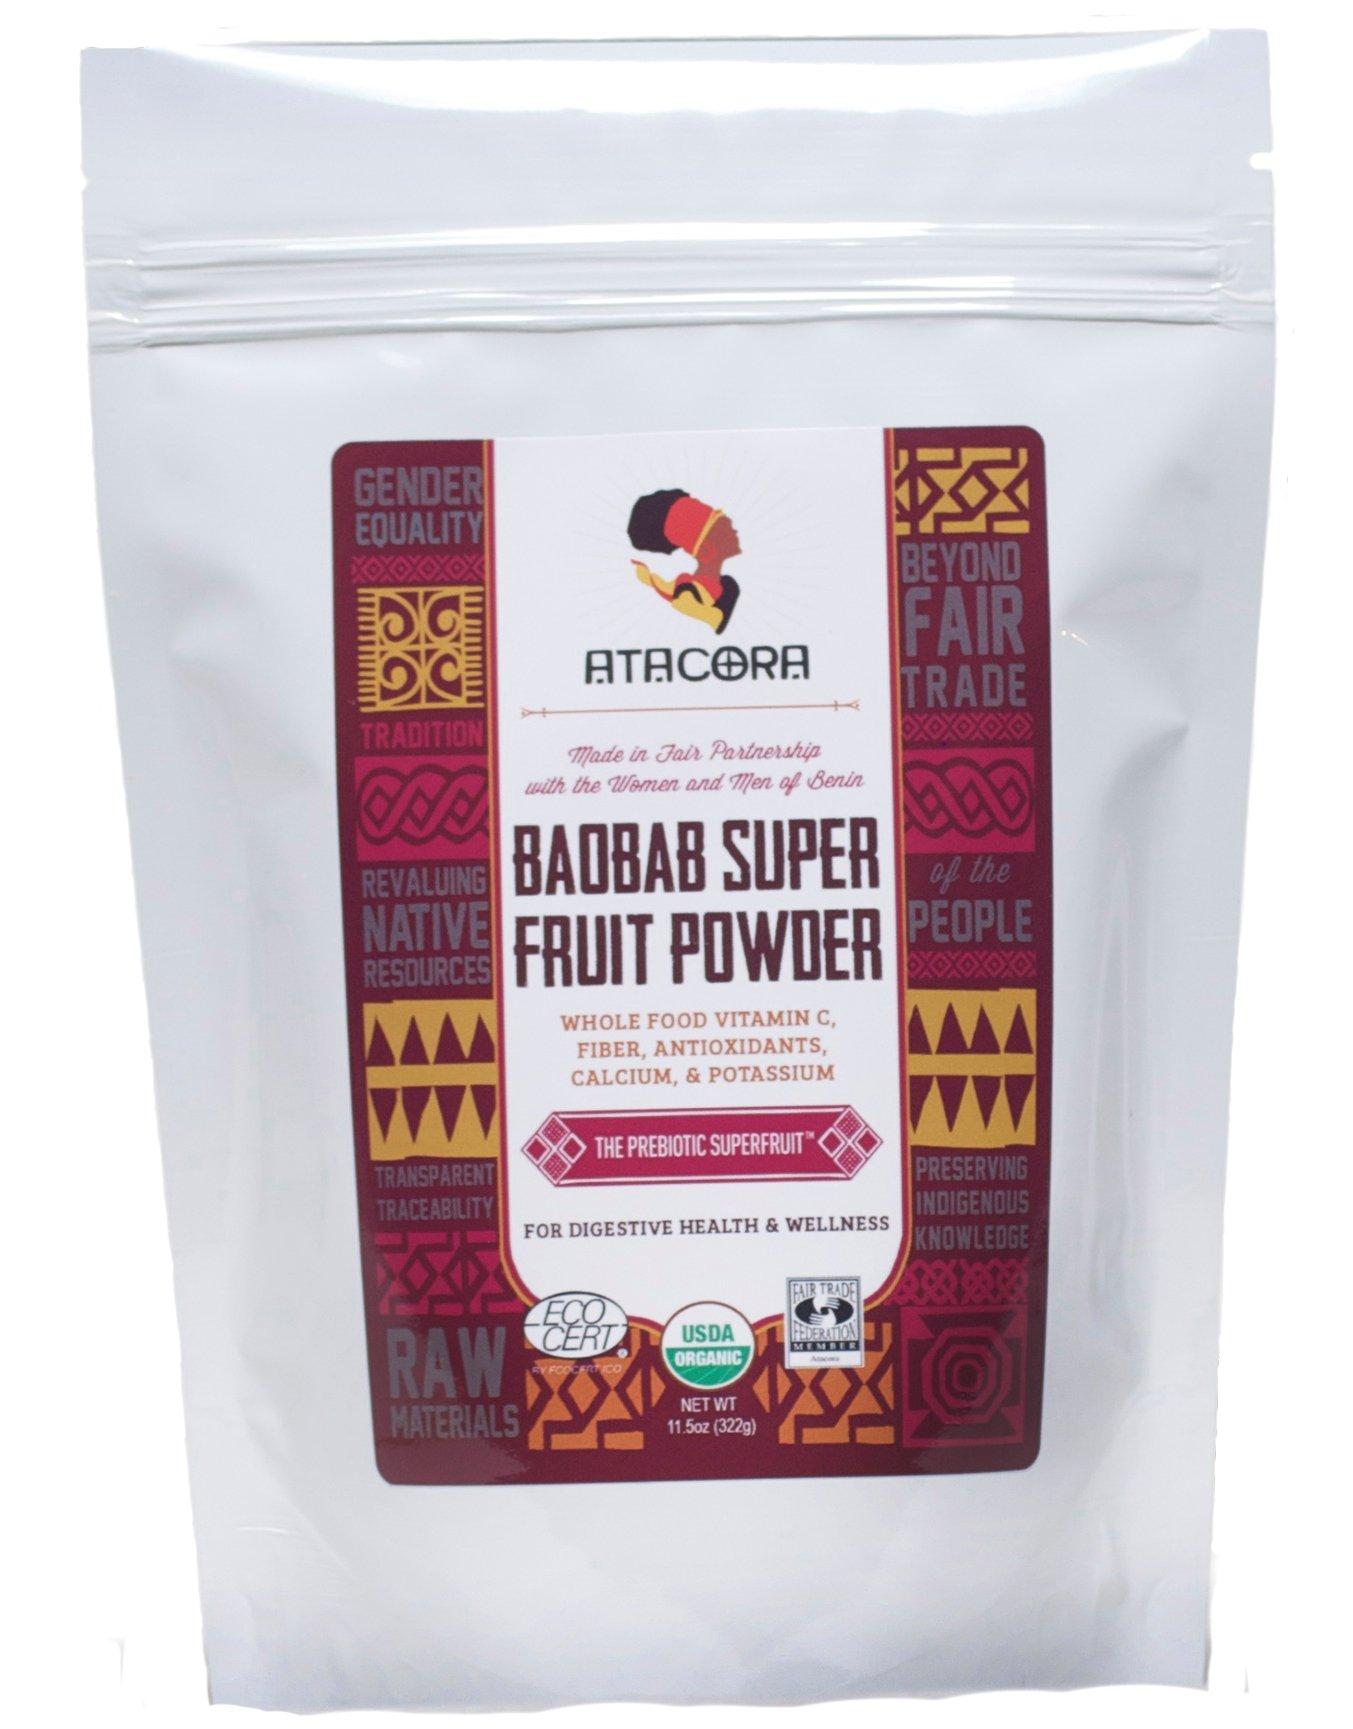 Atacora Fair Trade Certified Organic Baobab Super Fruit Powder 30 Day Supply In Travel-Ready Resealable BPA Free Bag, 11.5 Oz. by Atacora